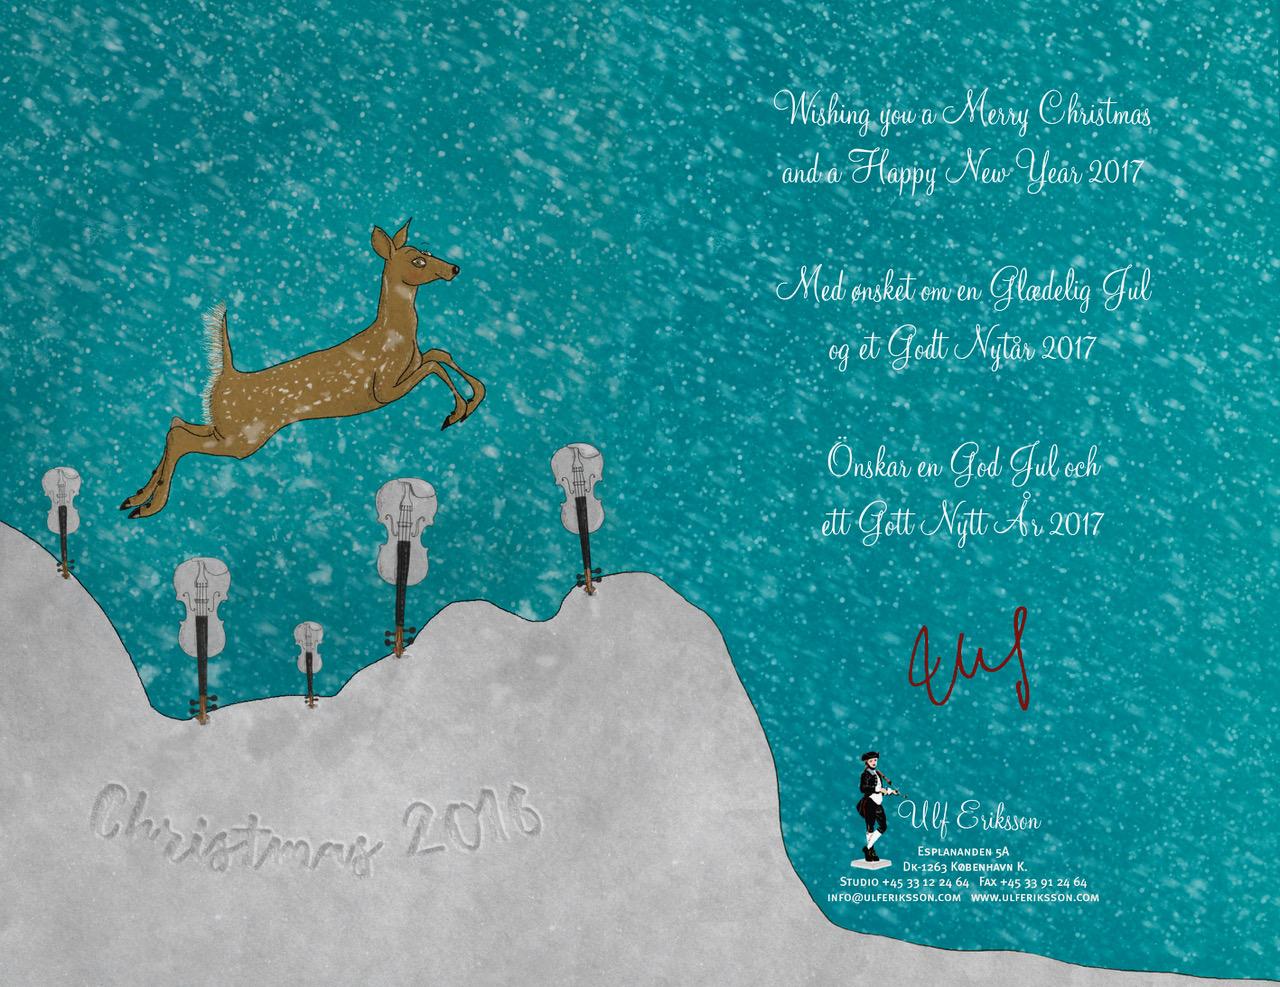 1a49d719c020 Merry Christmas! Happy New Year! Glædelig Jul og Godt Nytår! God Jul ...